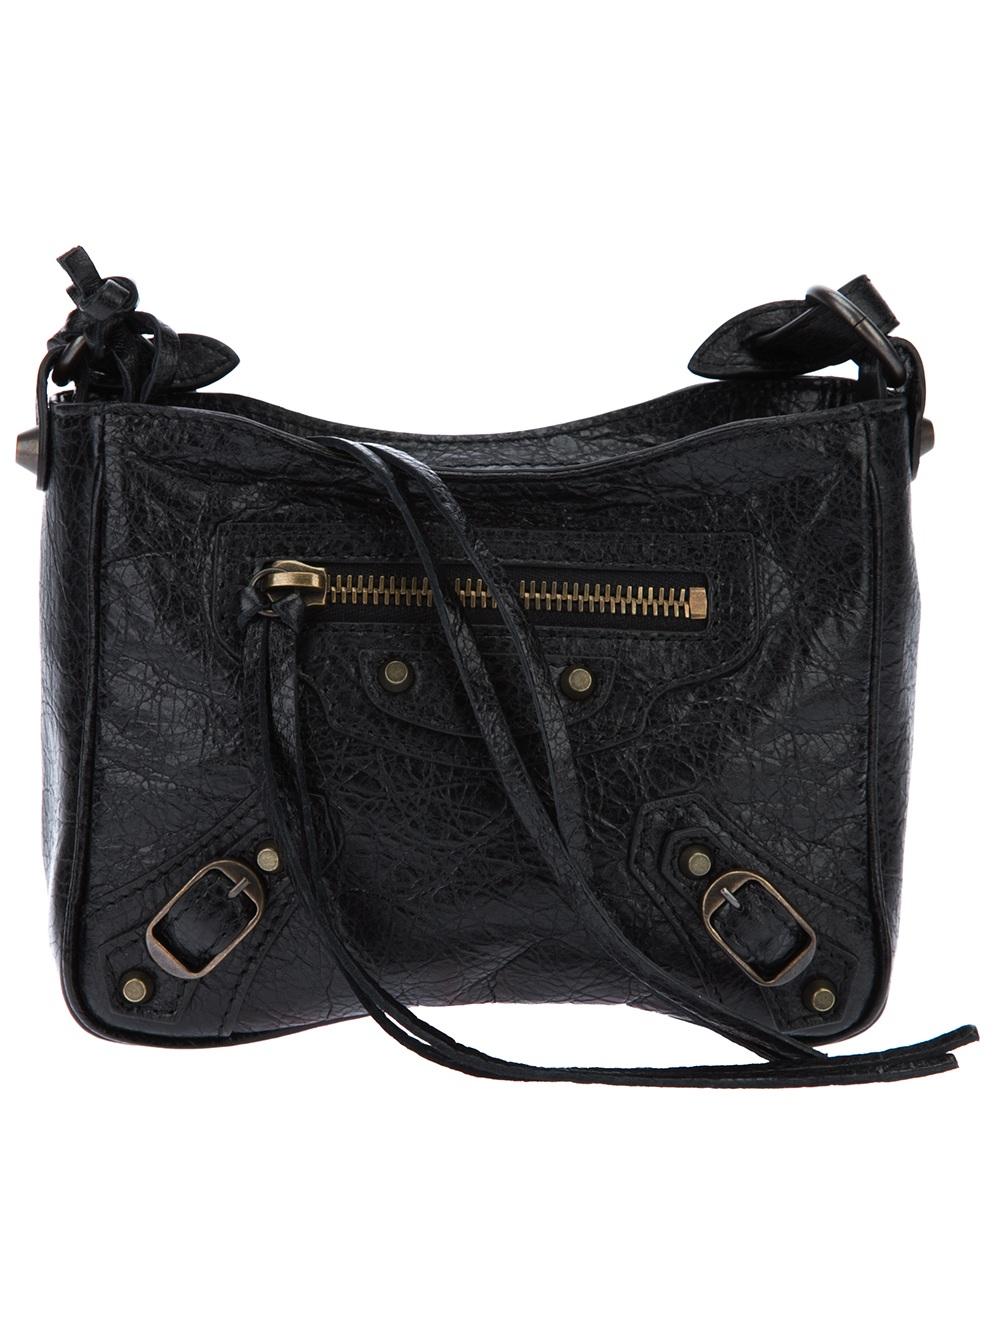 0af56dc410 Balenciaga Mini City Shoulder Bag in Black - Lyst